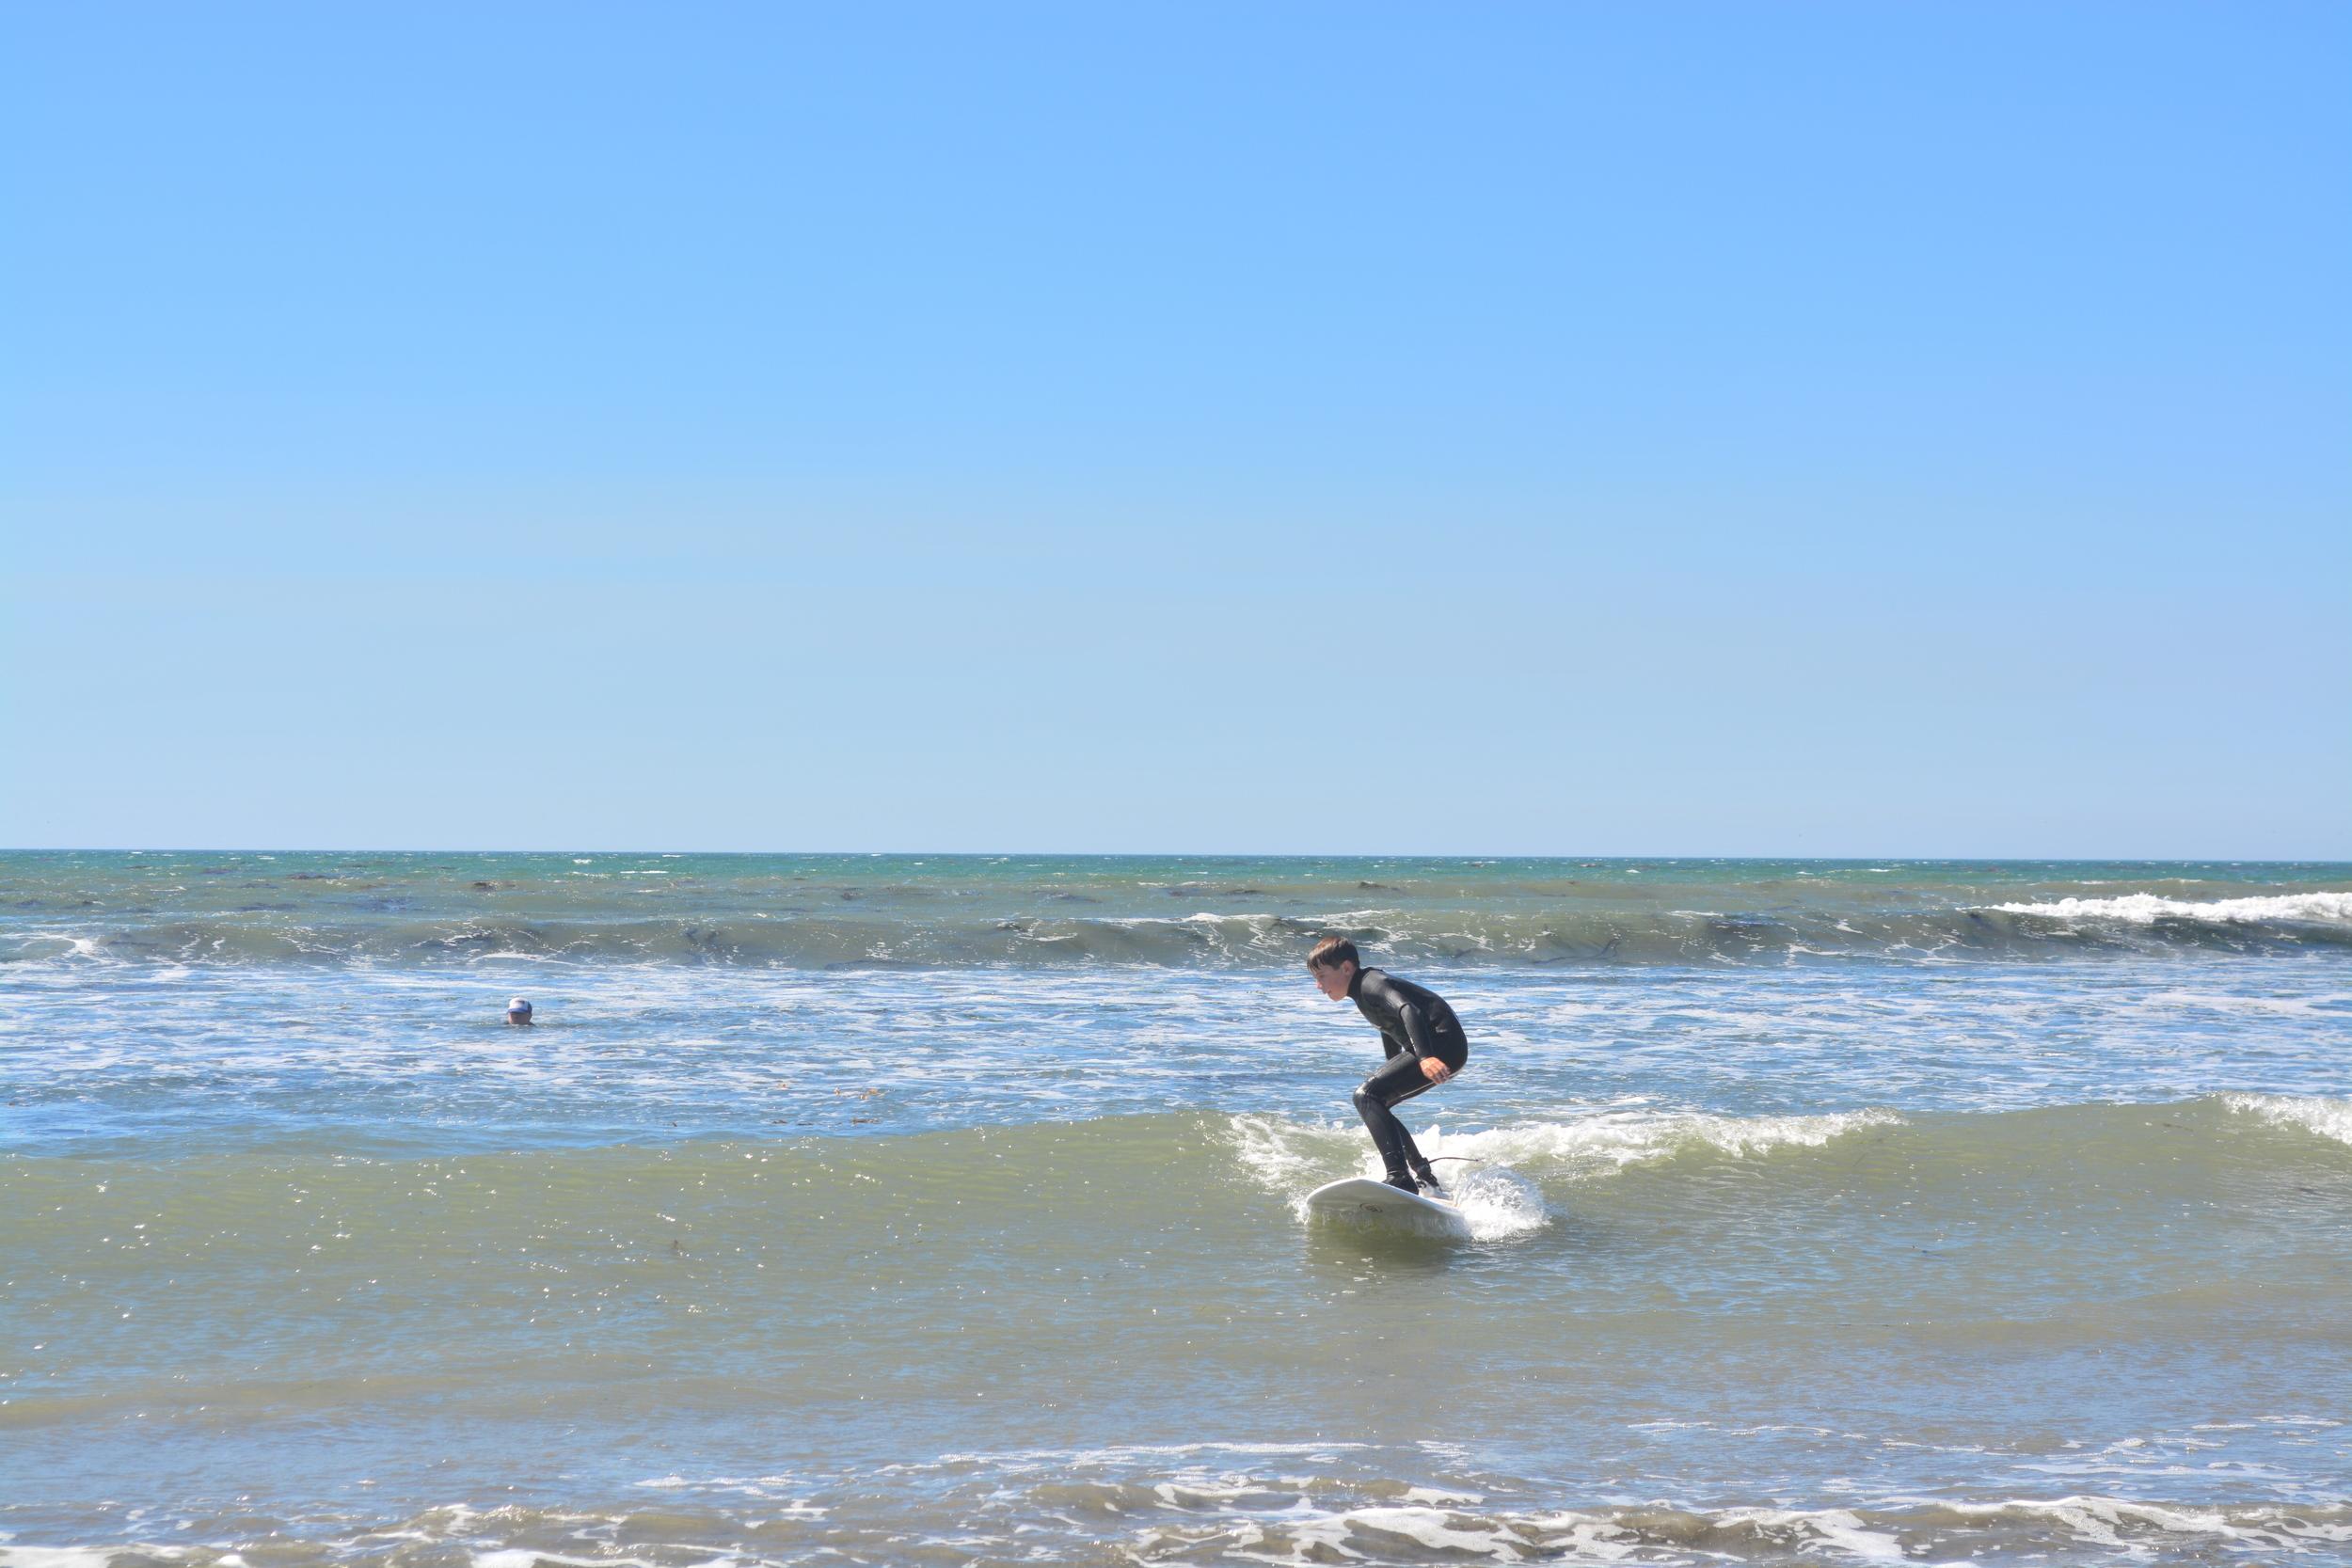 Baja California 10-5-13 Shipwrecks Surfing Adventure Ocean Experience Surf School San Diego (20).JPG